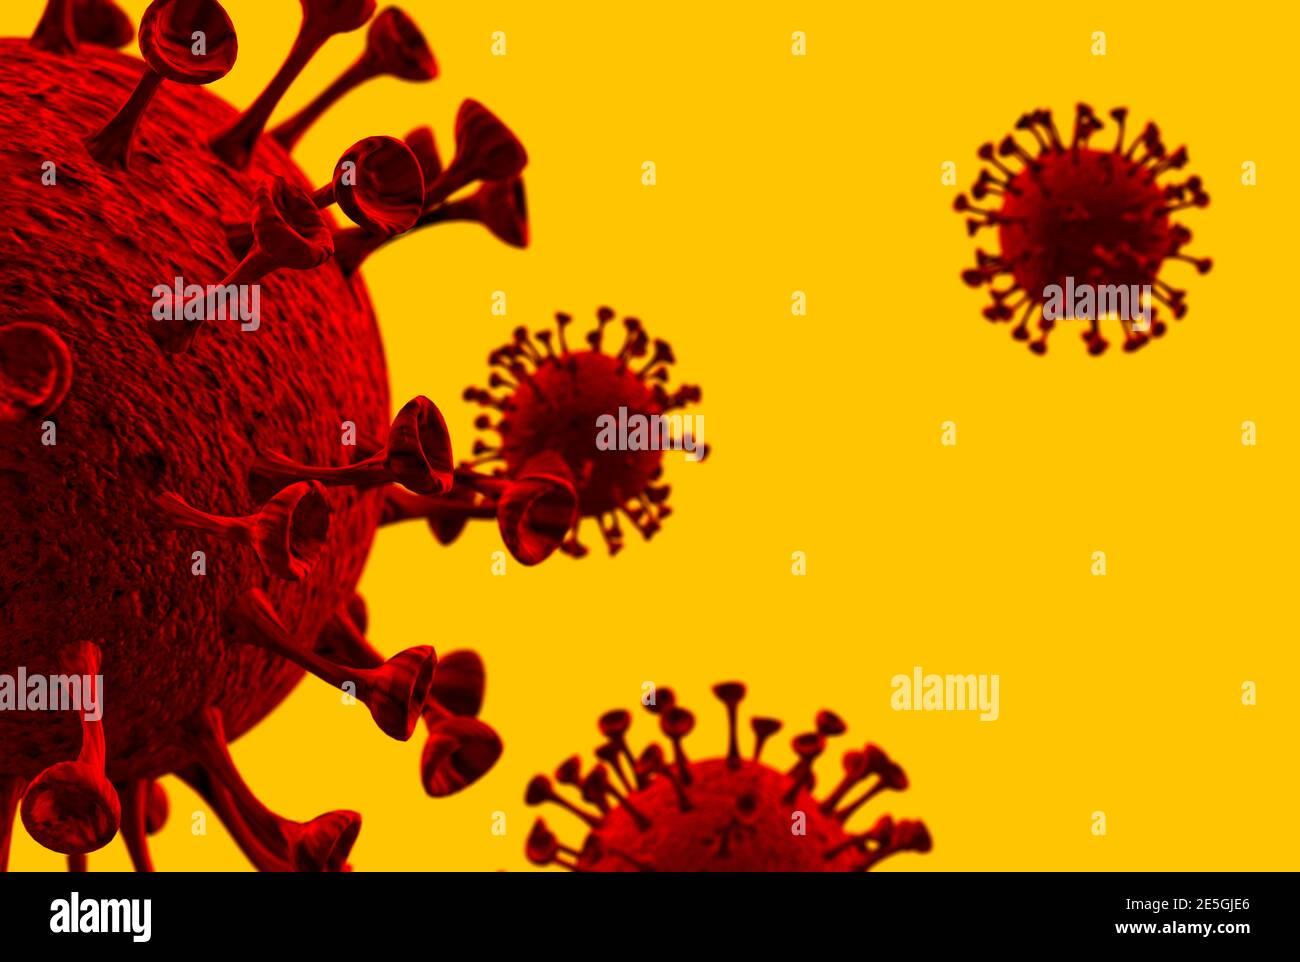 vue microscopique des particules covid 19 avec un dos vibrant rendu 3d sol Banque D'Images